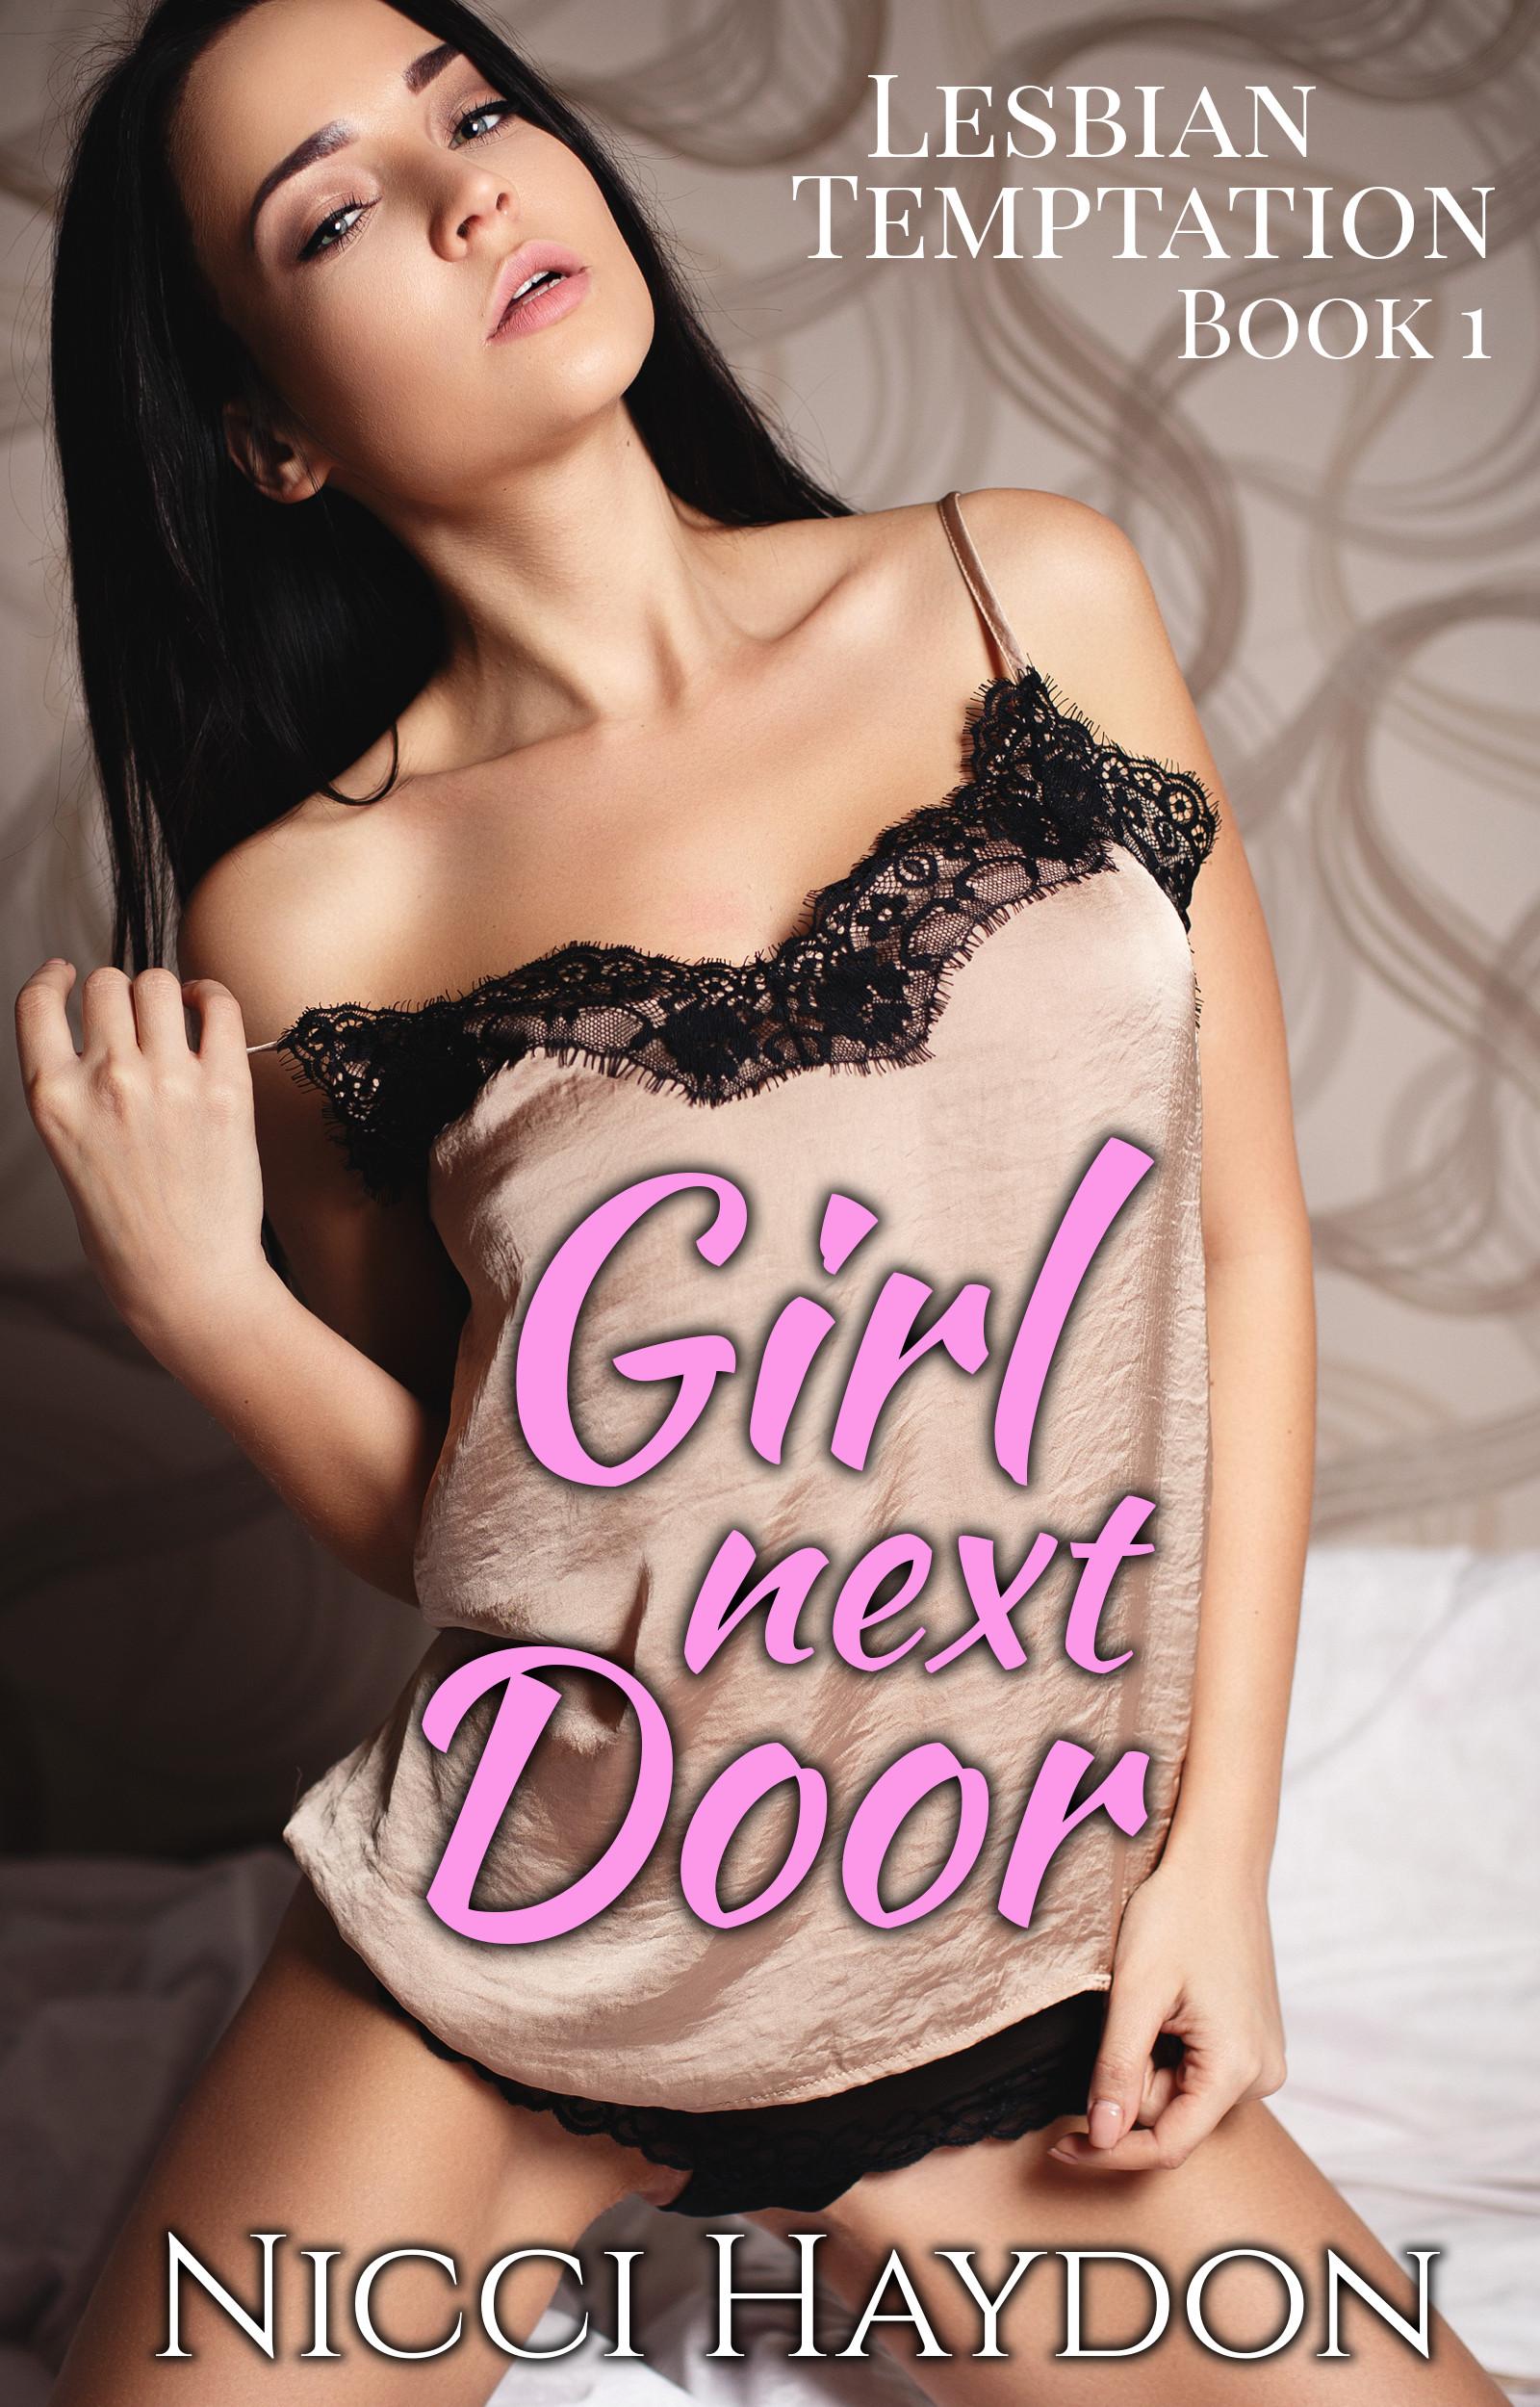 Girl Next Door - Lesbian Temptation Book 1